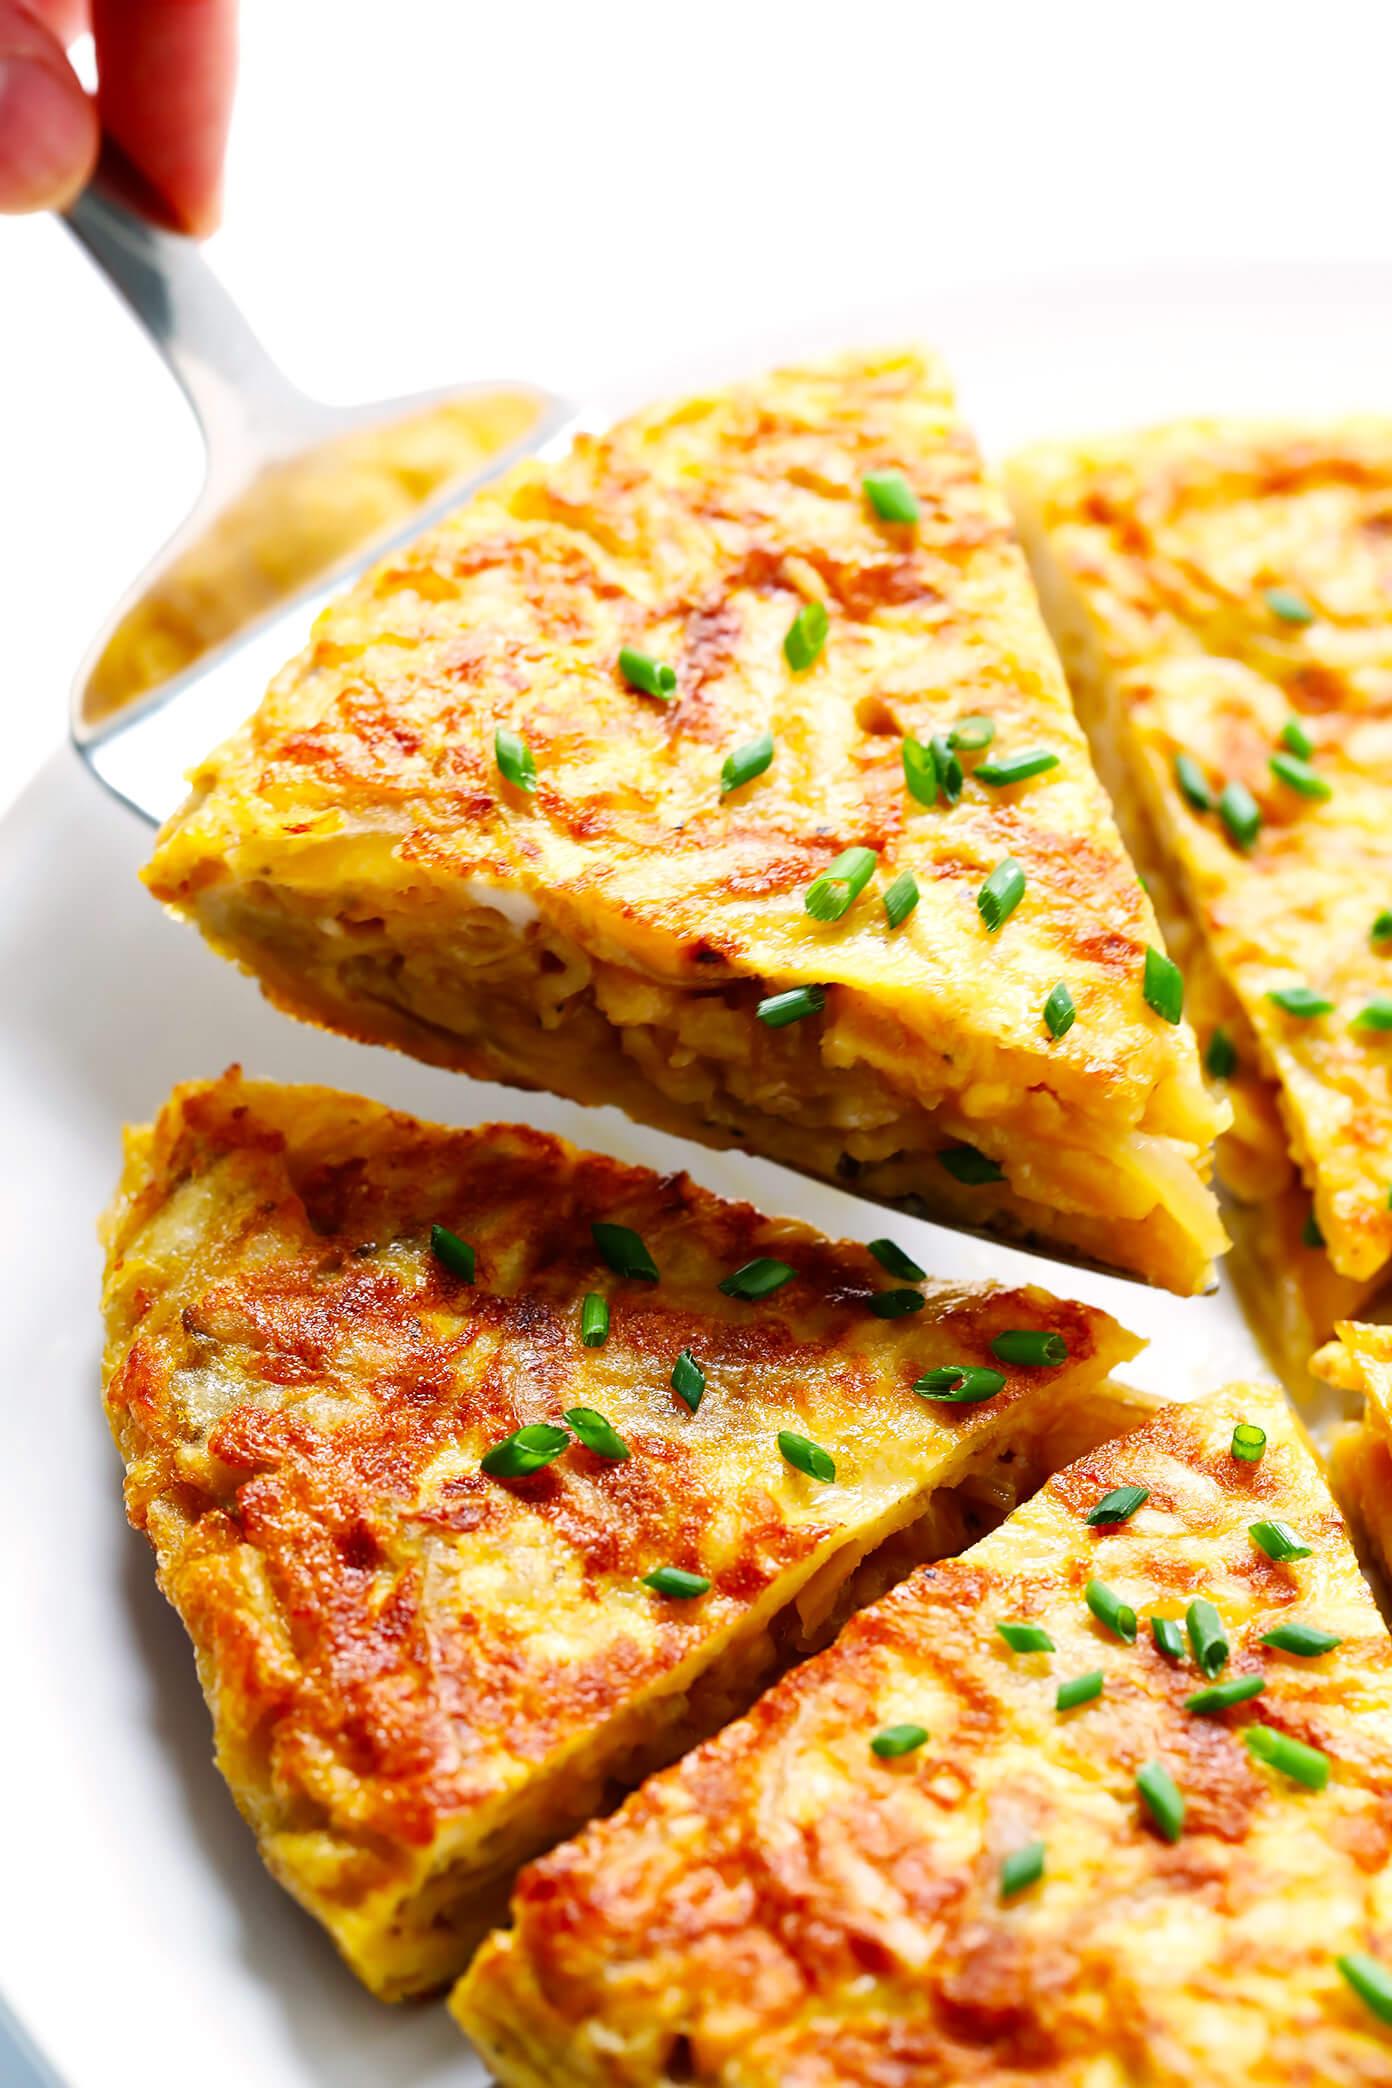 Za doručak odaberite španski omlet